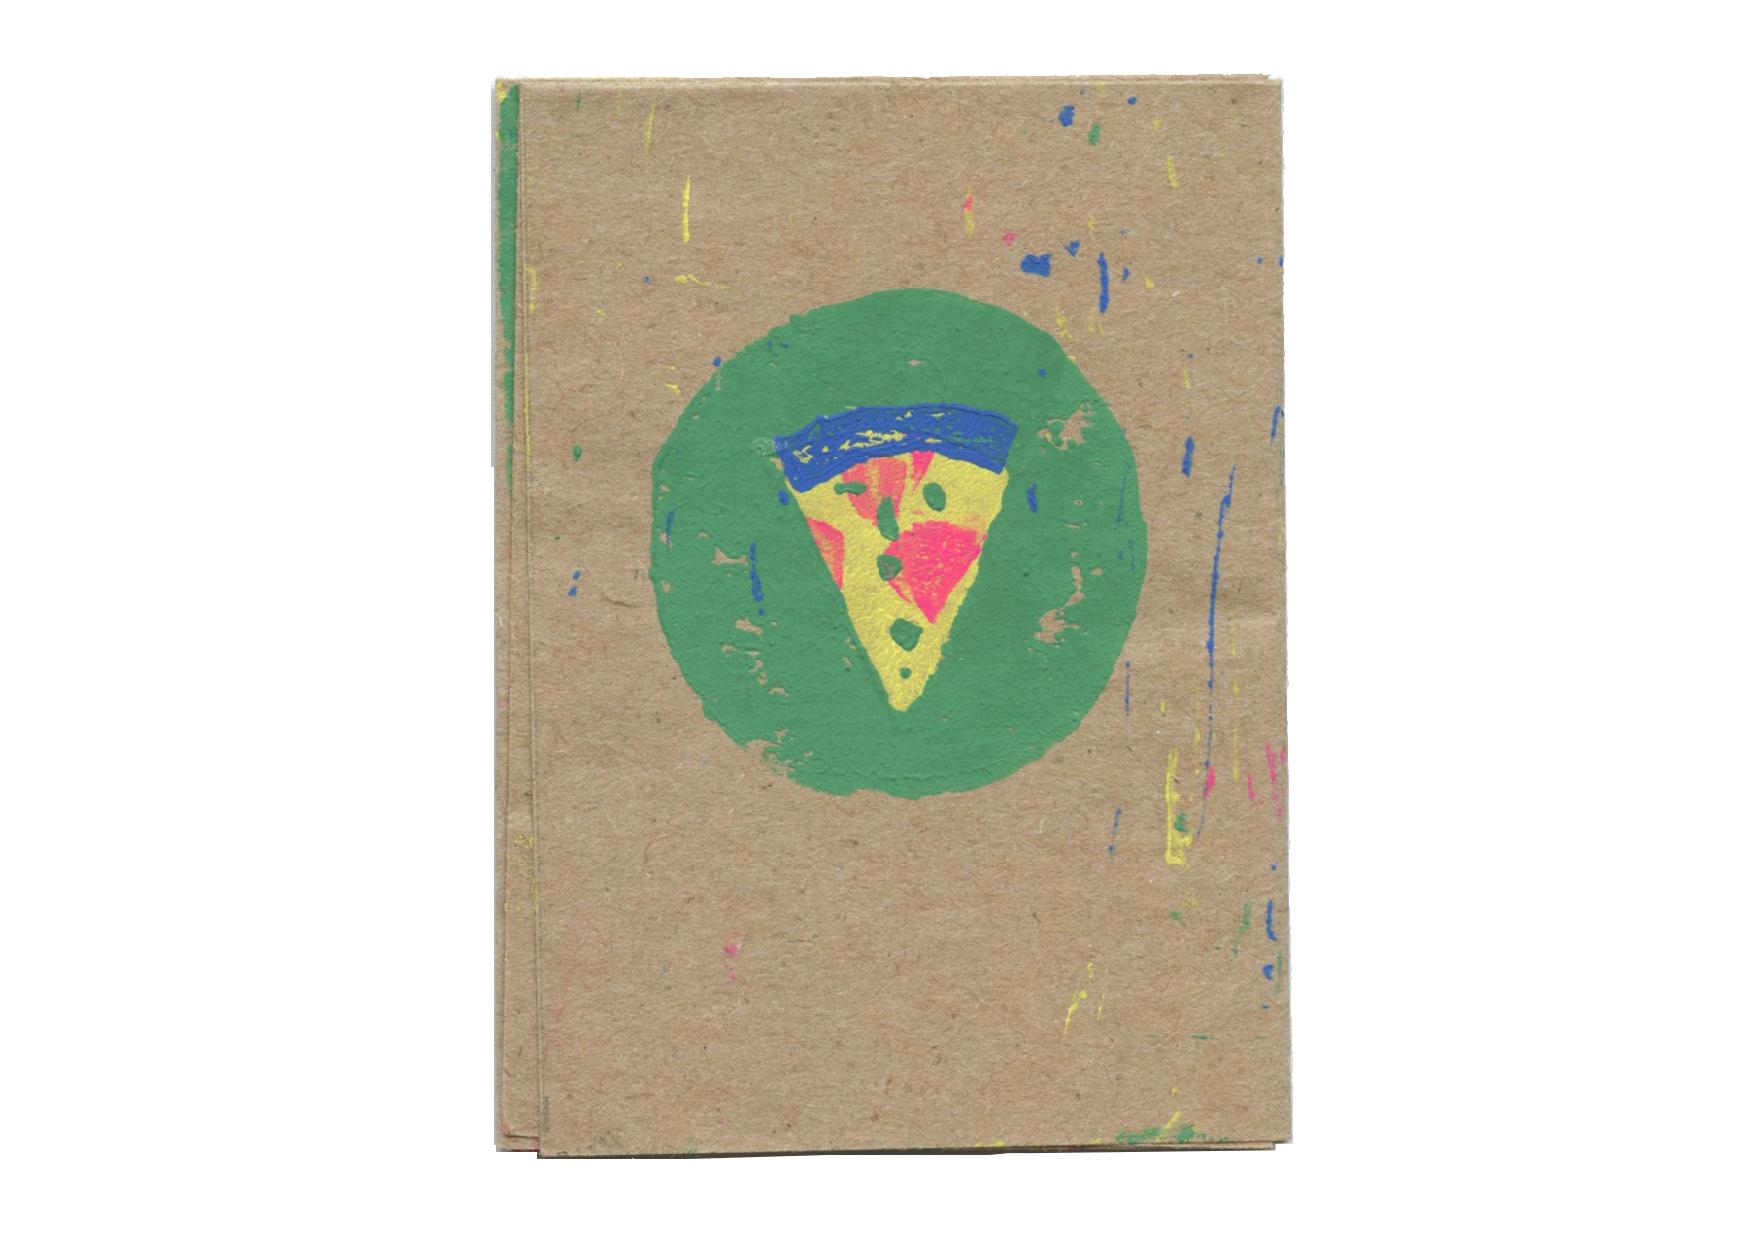 pizza_6_comics_post.jpg